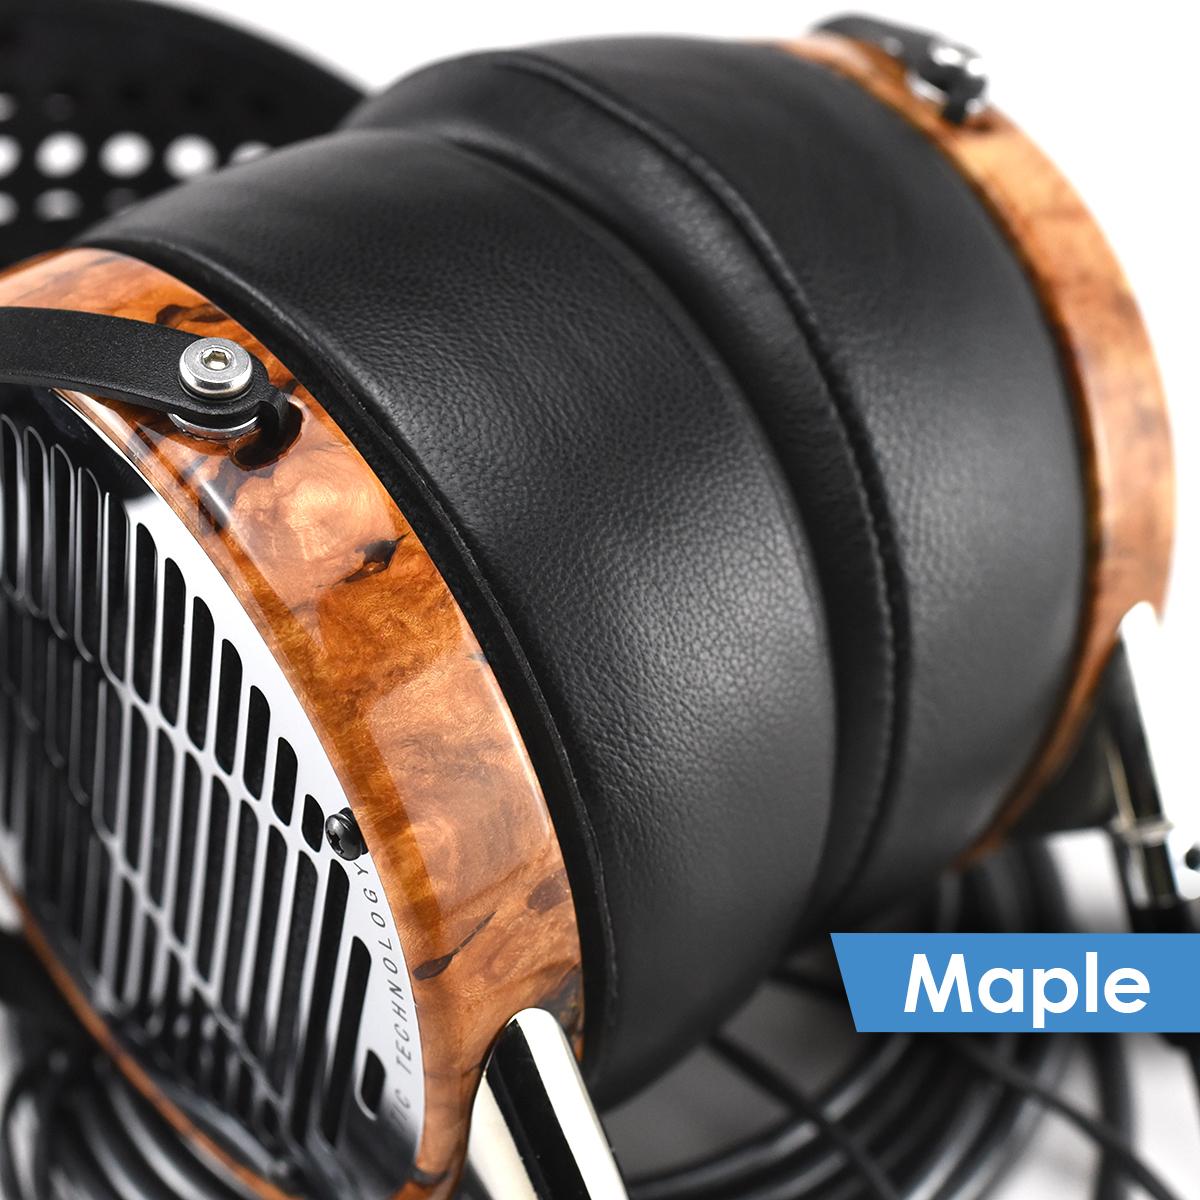 Audeze LCD-4 Maple